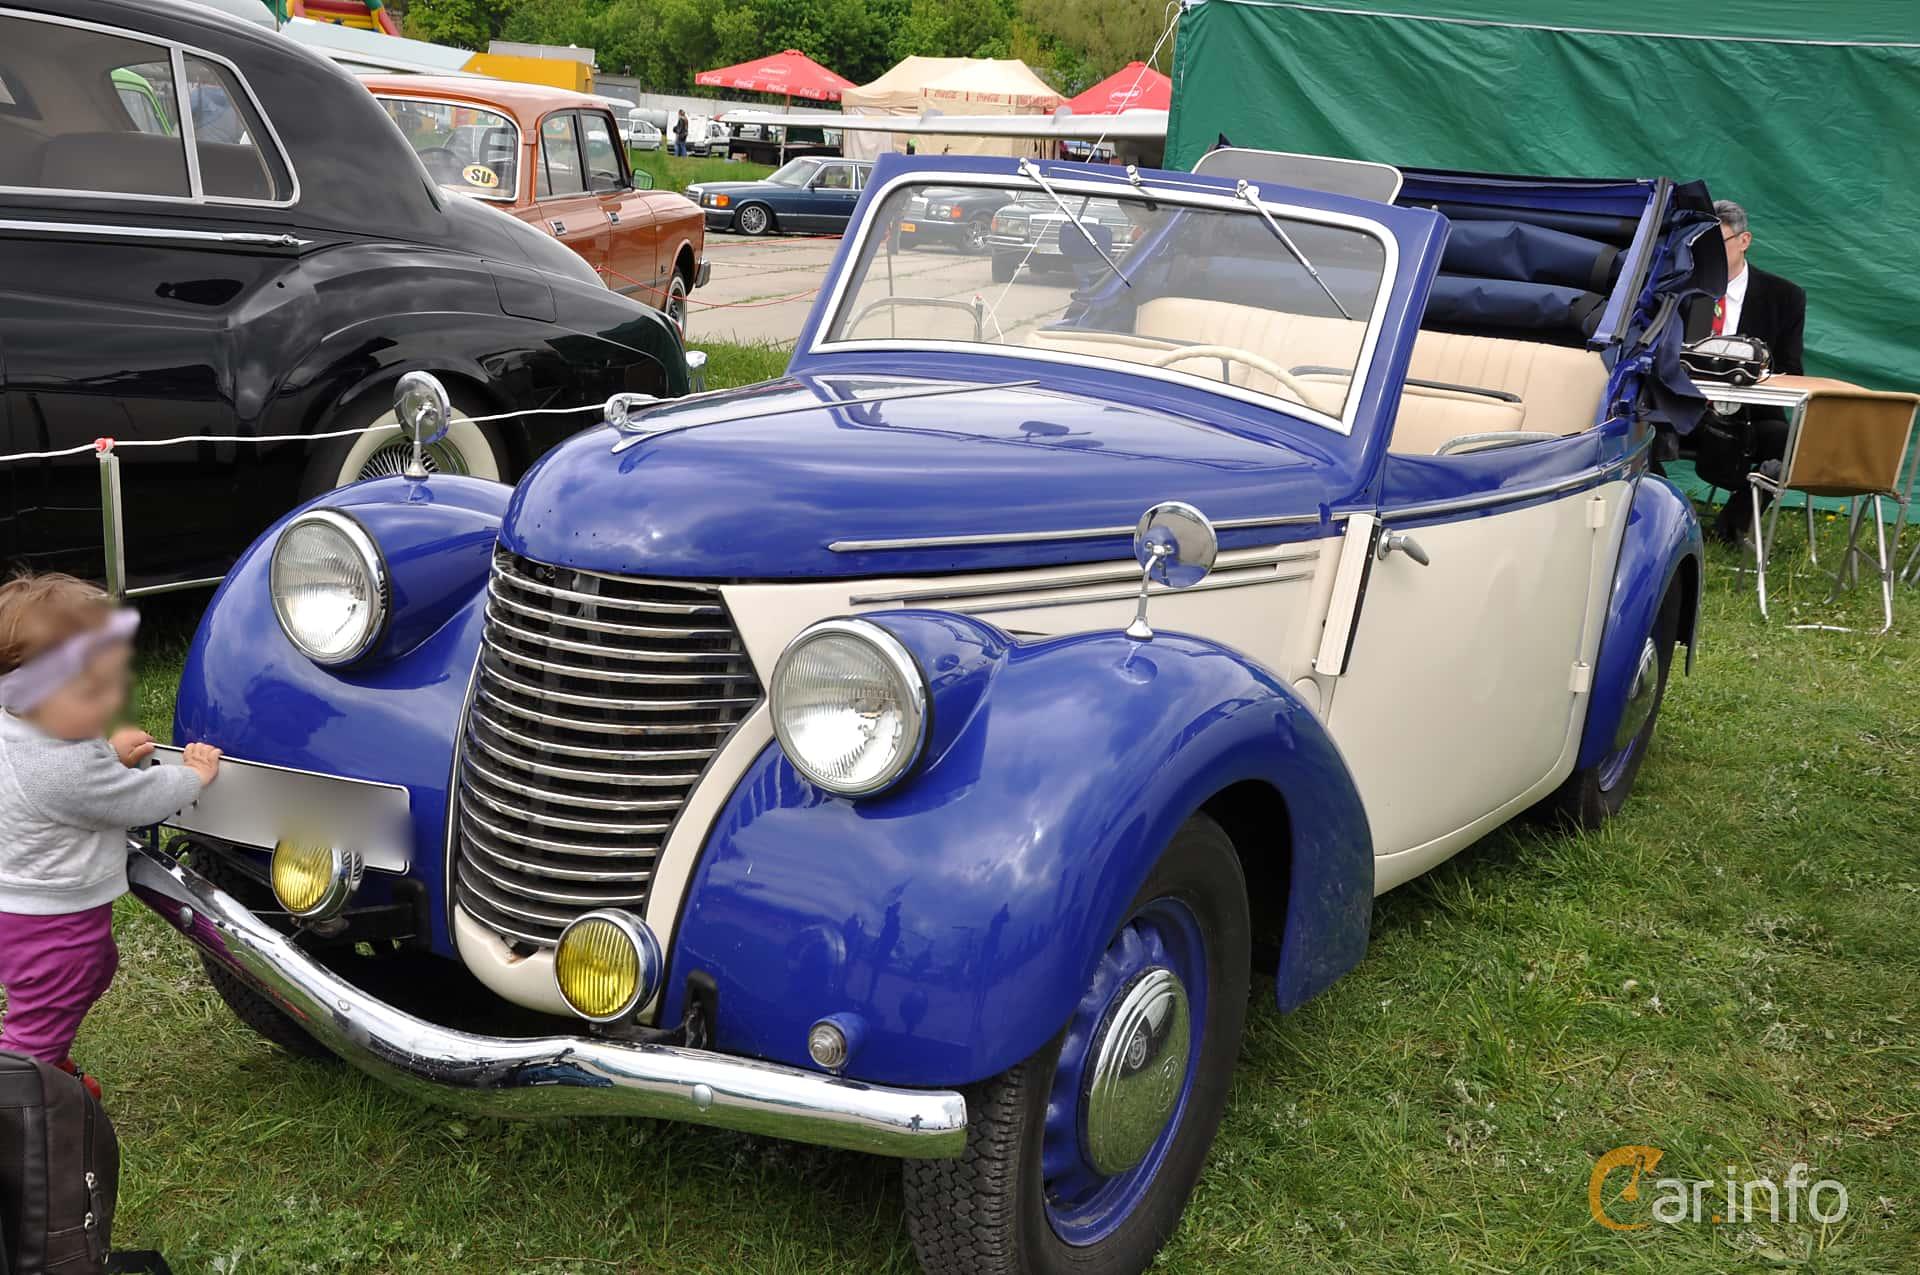 Skoda Popular 1100 OHV Convertible 1.1 Manuell, 30hk, 1939 at Old Car Land no.1 2019